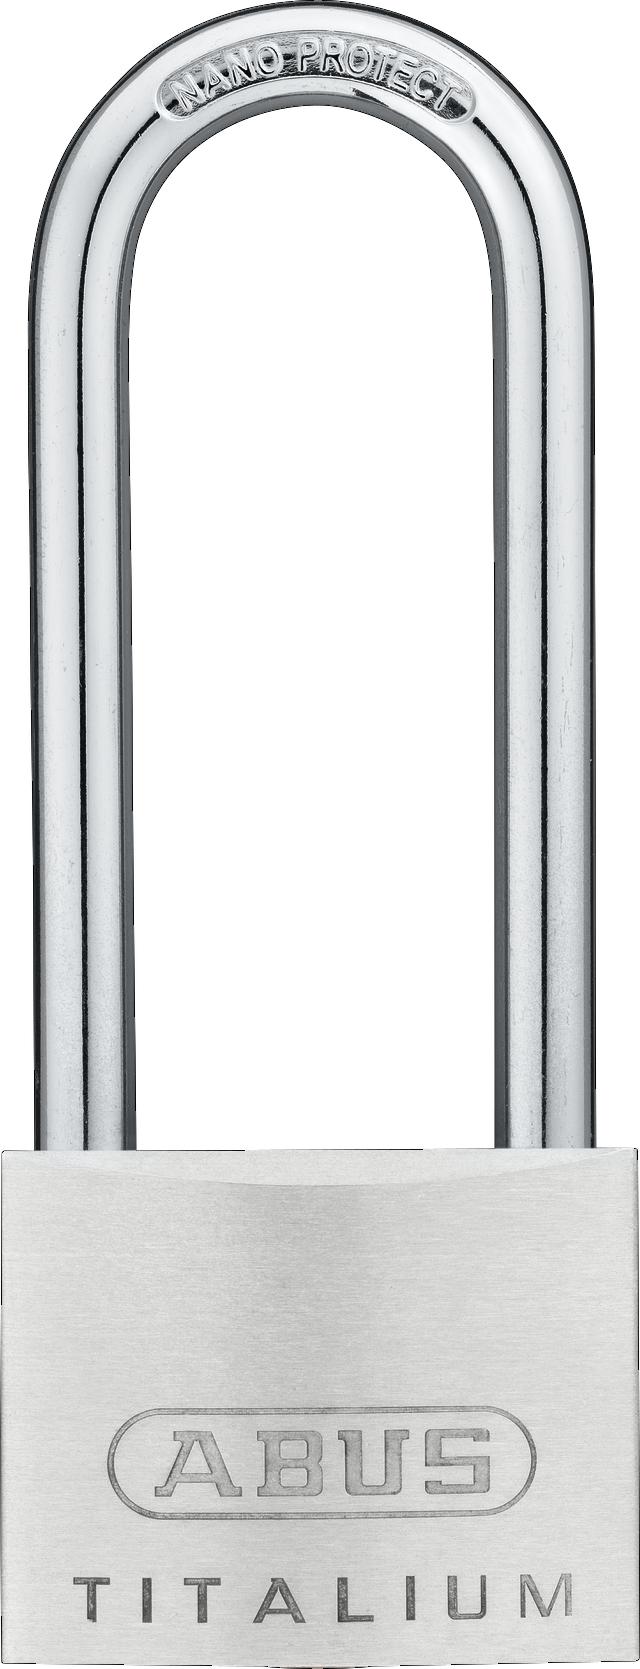 Vorhangschloss 64TI/50HB80 Lock-Tag